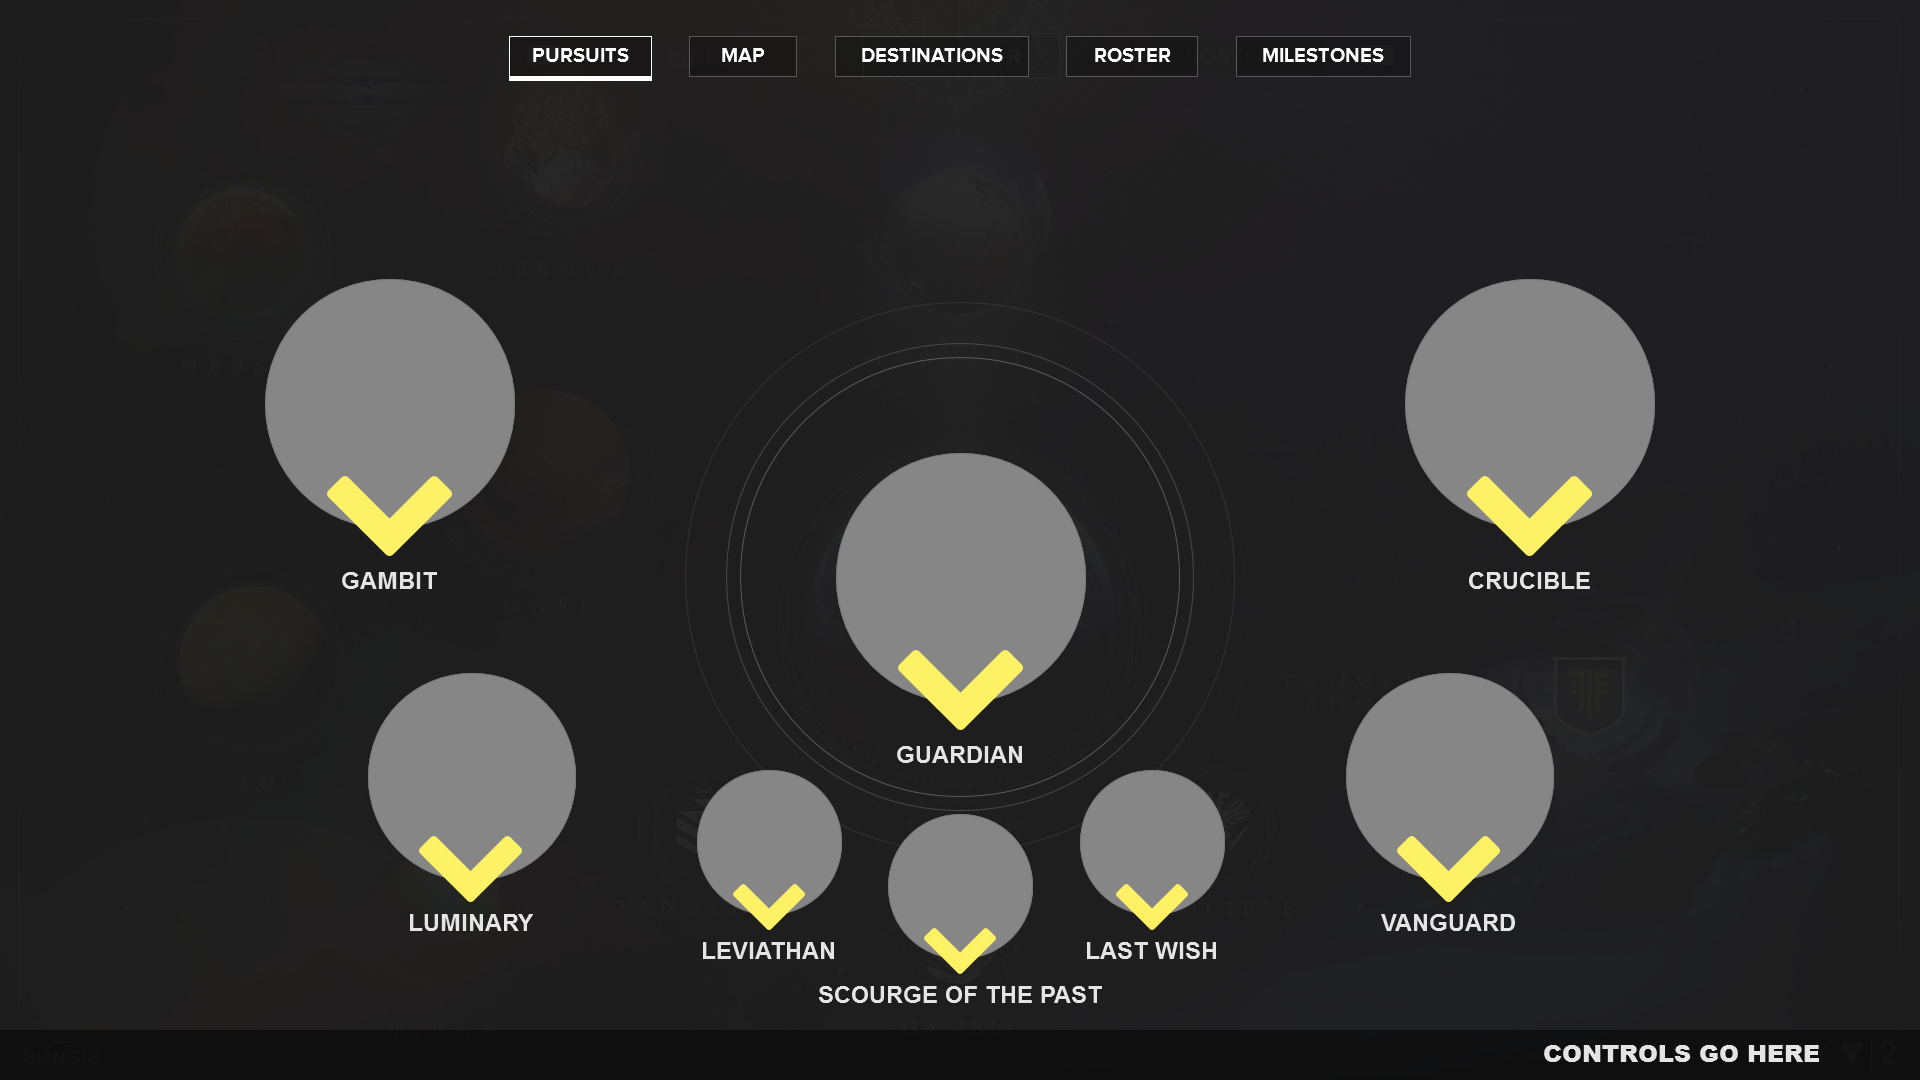 Destiny 2 Player Progression — Ash Duong